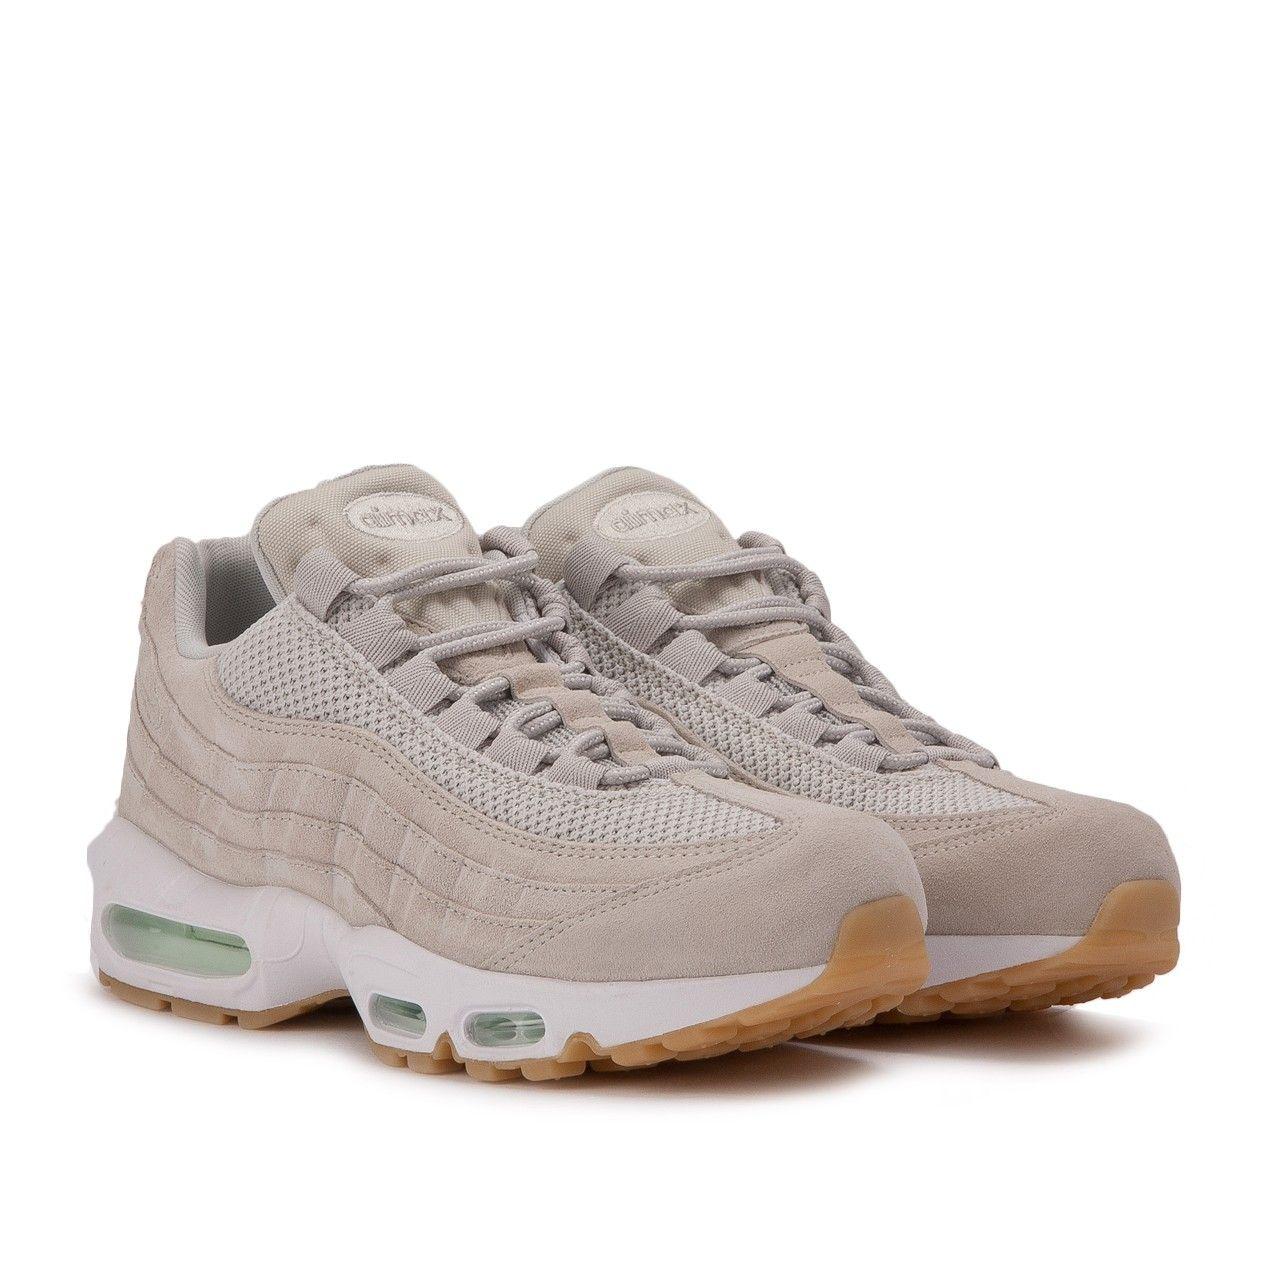 competitive price fe53a bf6db Nike Air Max 95 Premium (Light Bone) 538416-003